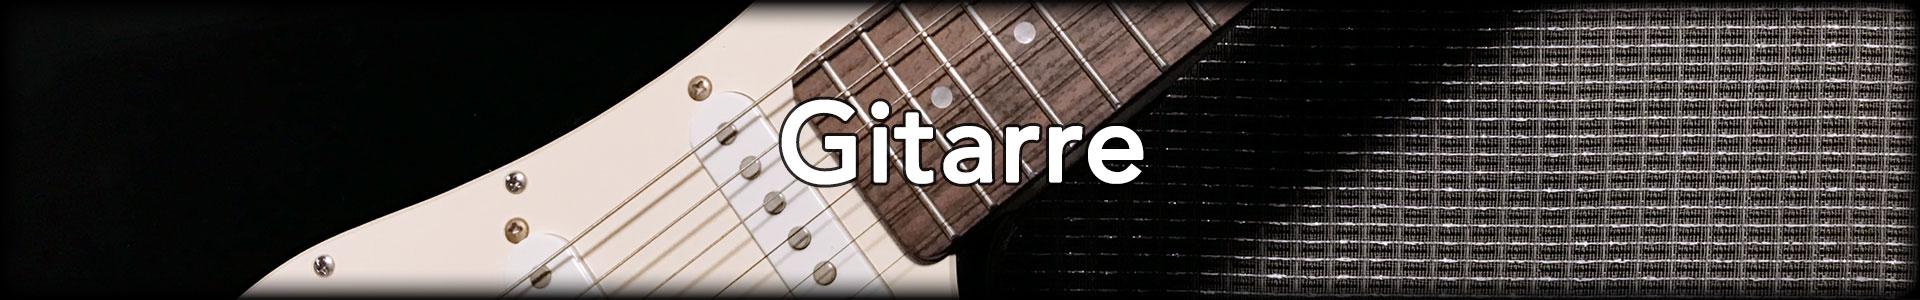 gitarre-btn-home-mobile